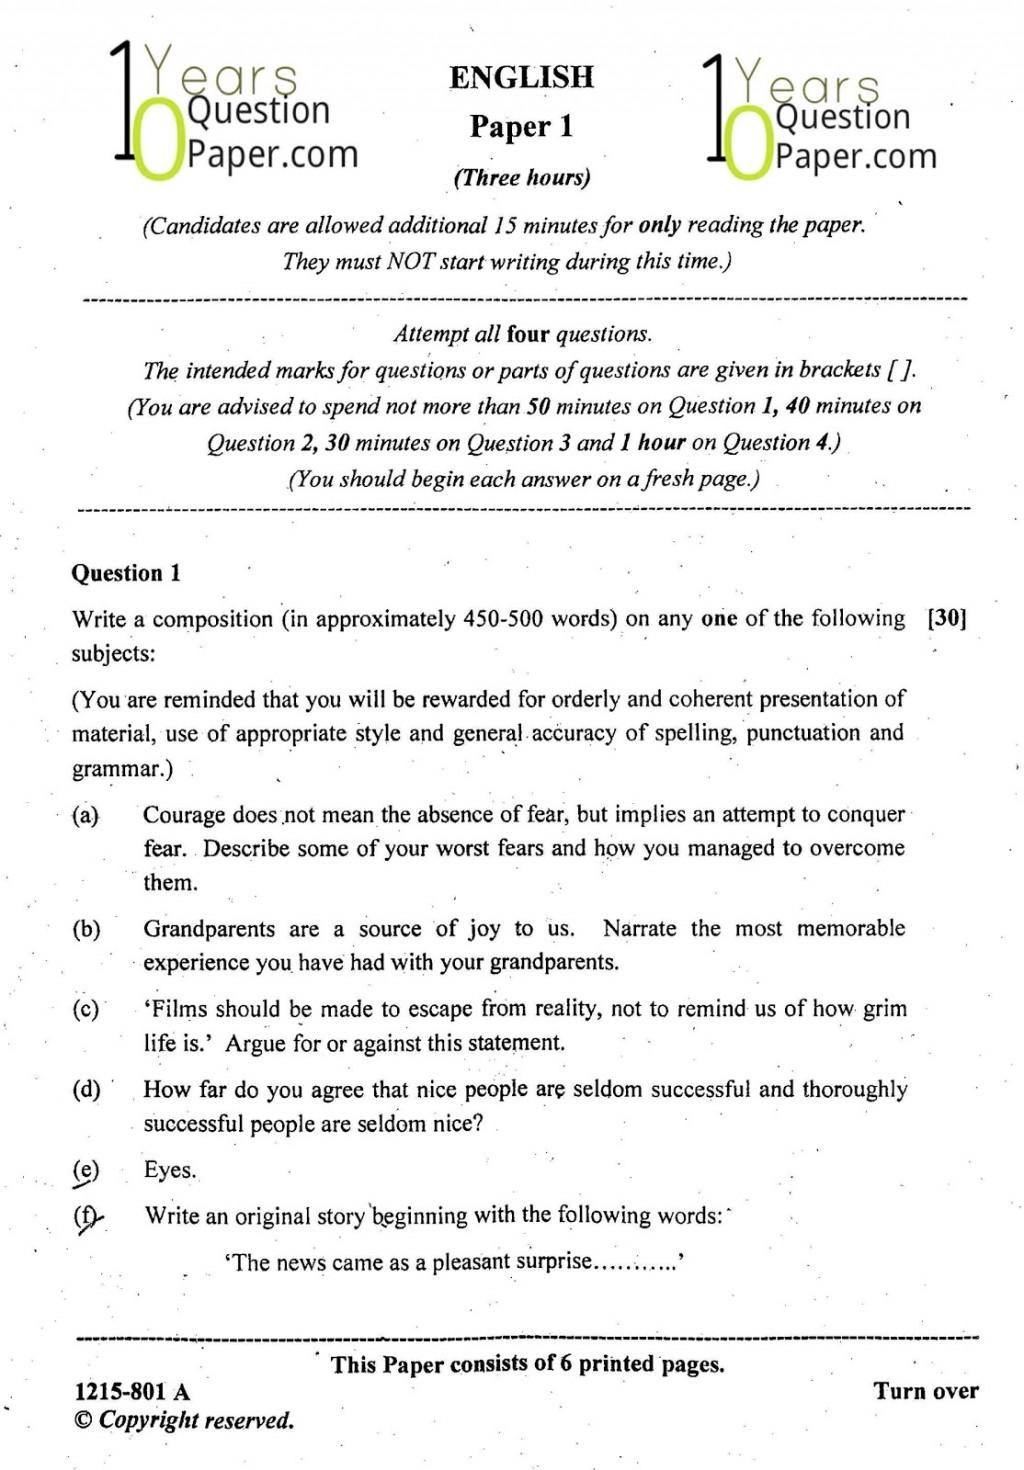 008 Essay Example English Topics Isc Paper Class Dreaded Literature Question For 10 Icse 2015 Maharashtra Board Large